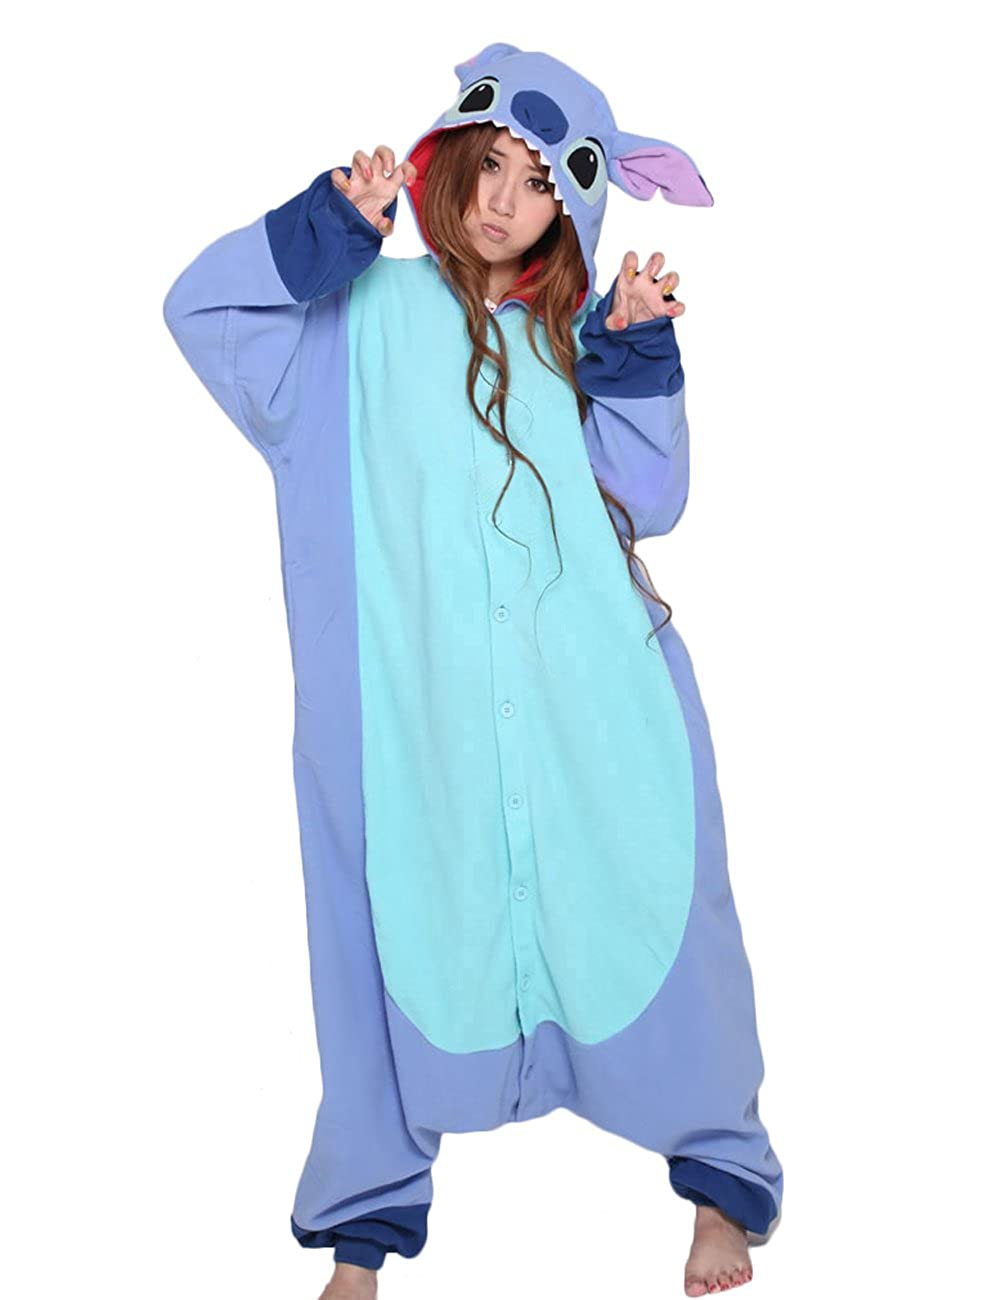 216f4c889231 Amazon.com  Lilo   Stitch Onesie for Adult and Teenagers. Animal Pajama  Costume.  Toys   Games